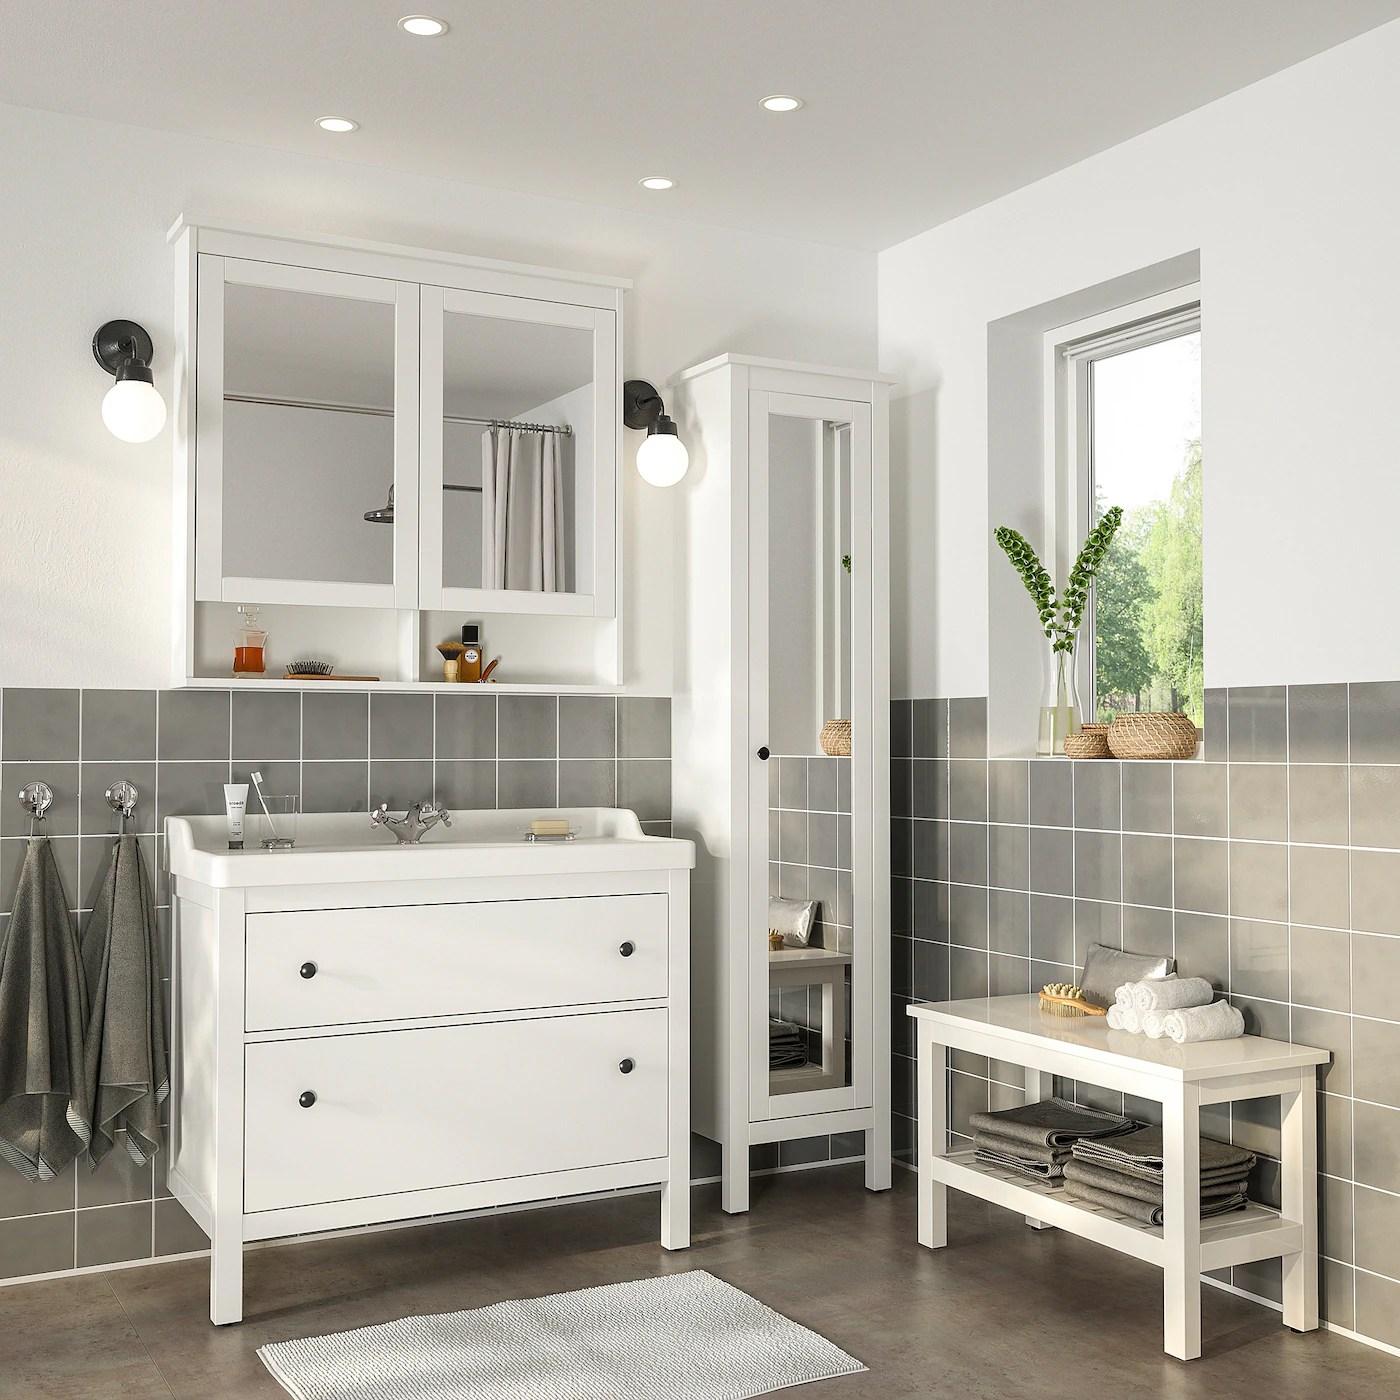 hemnes rattviken mobilier salle de bain 5 pieces blanc runskar mitigeur lavabo 102 cm